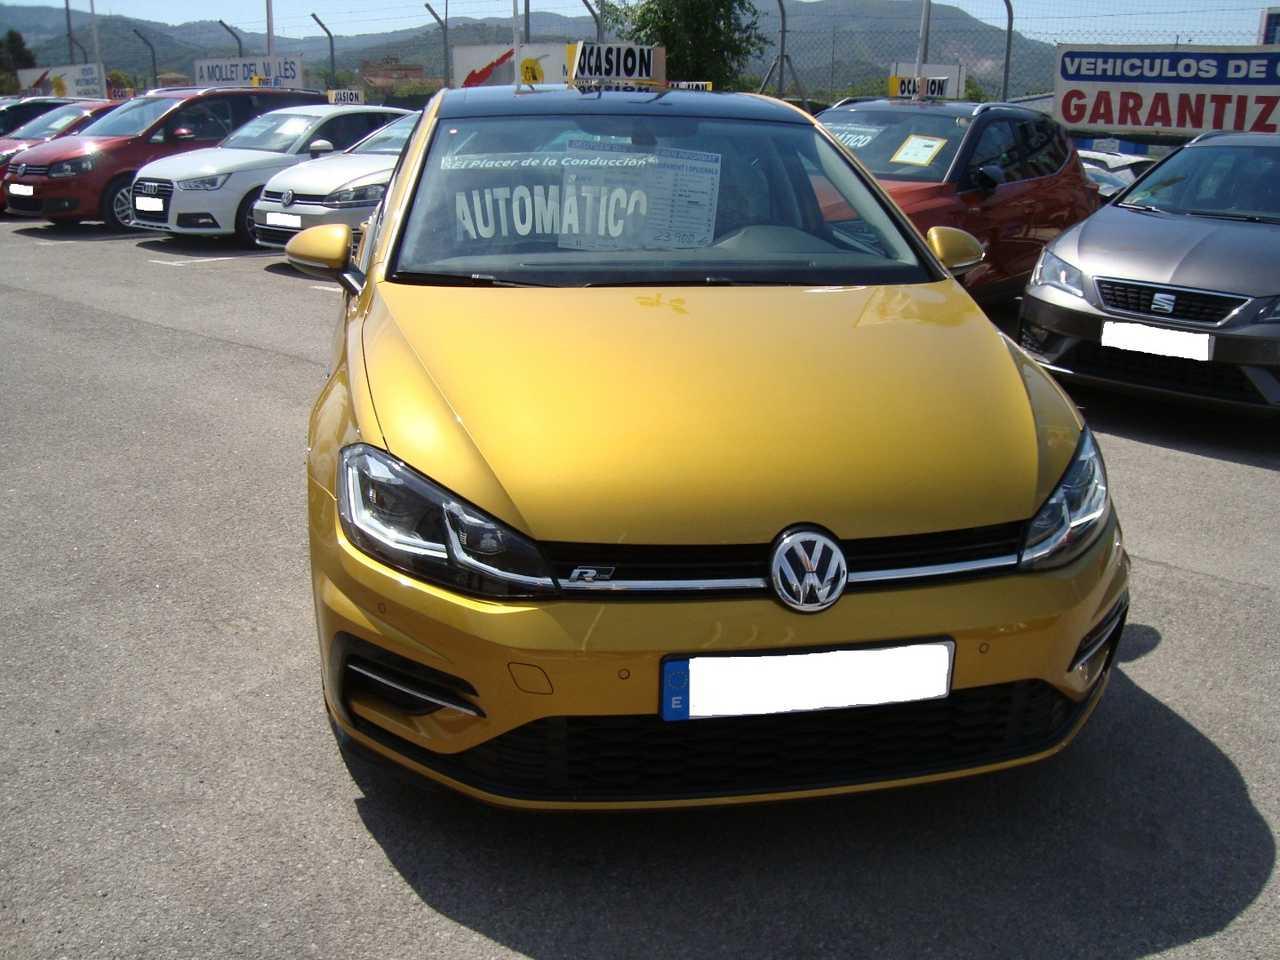 Volkswagen Golf 1.6 TDI 115 CV RLINE SPORT DSG   - Foto 1